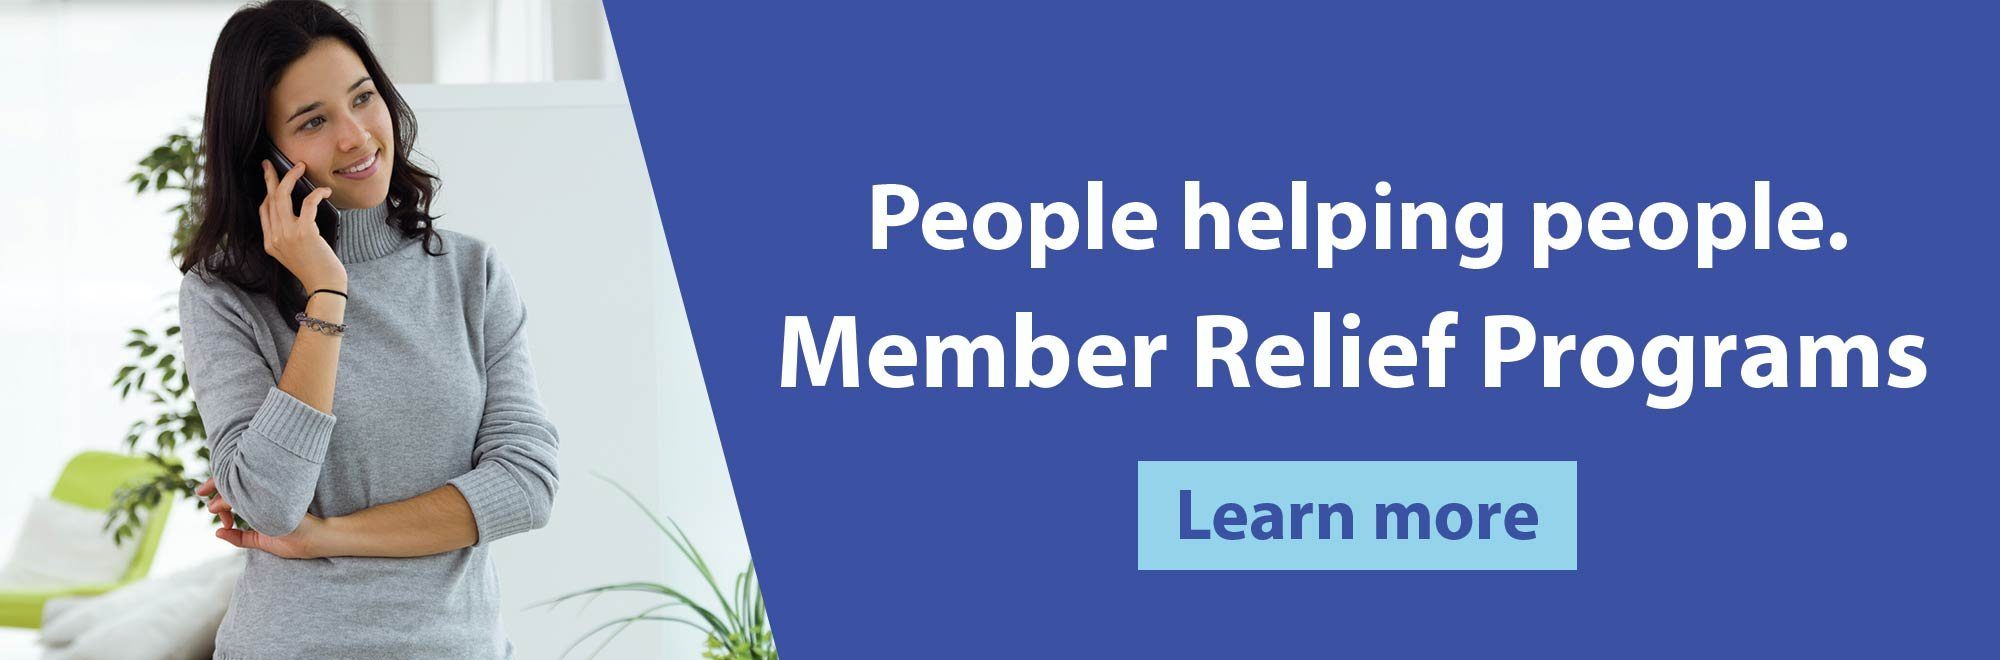 People helping people. Member Relief Programs. Learn more.